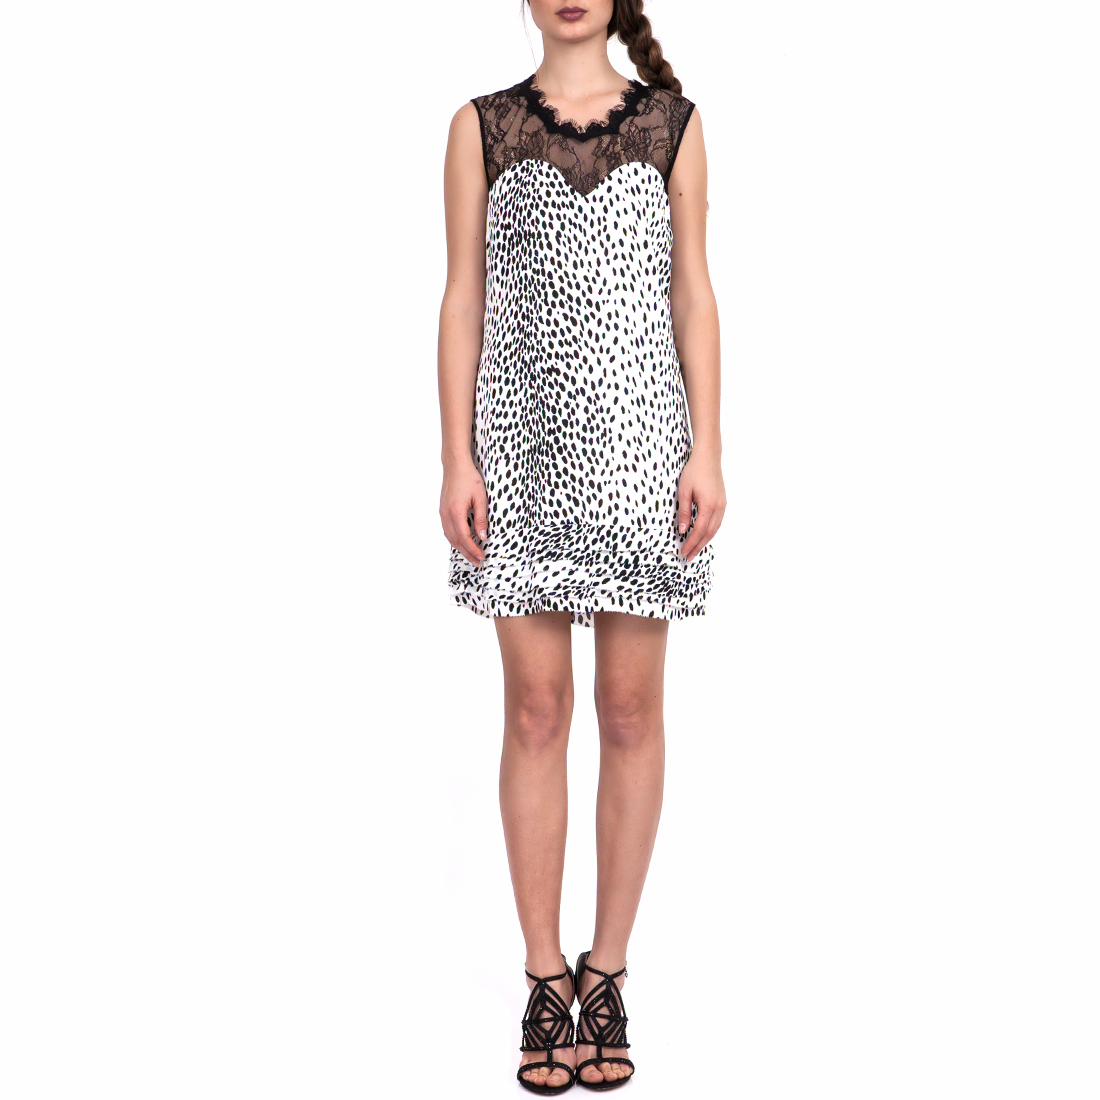 GUESS - Γυναικείο Φόρεμα GUESS Λευκό-Μαύρο